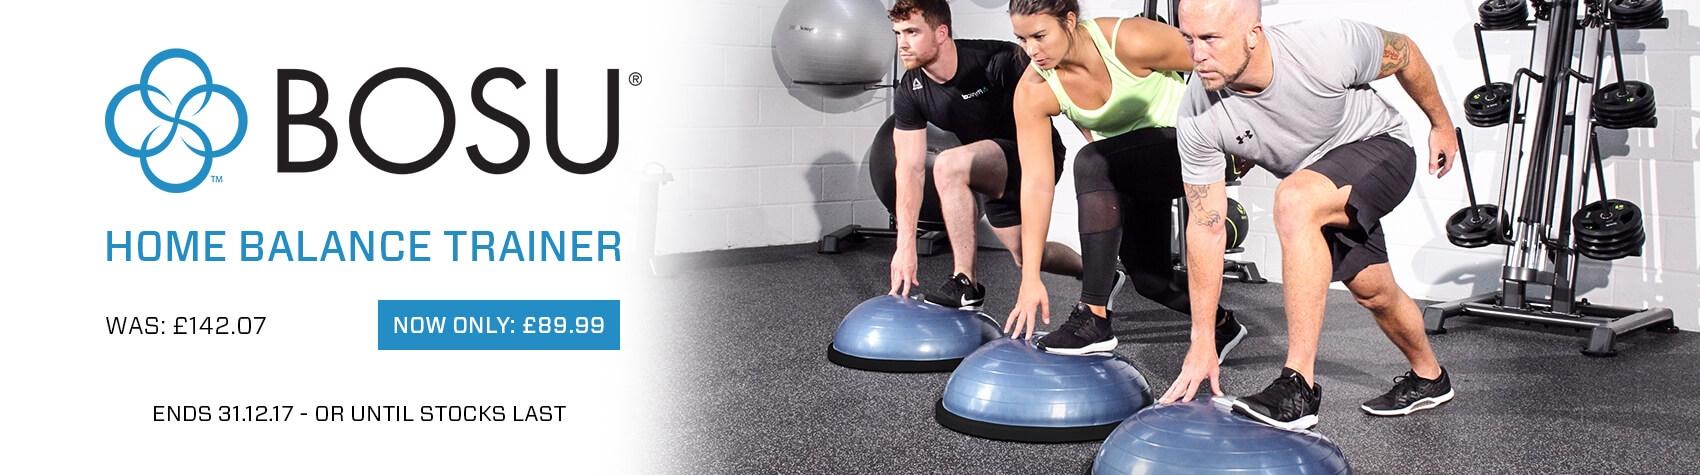 BOSU Home Balance Trainer Sale